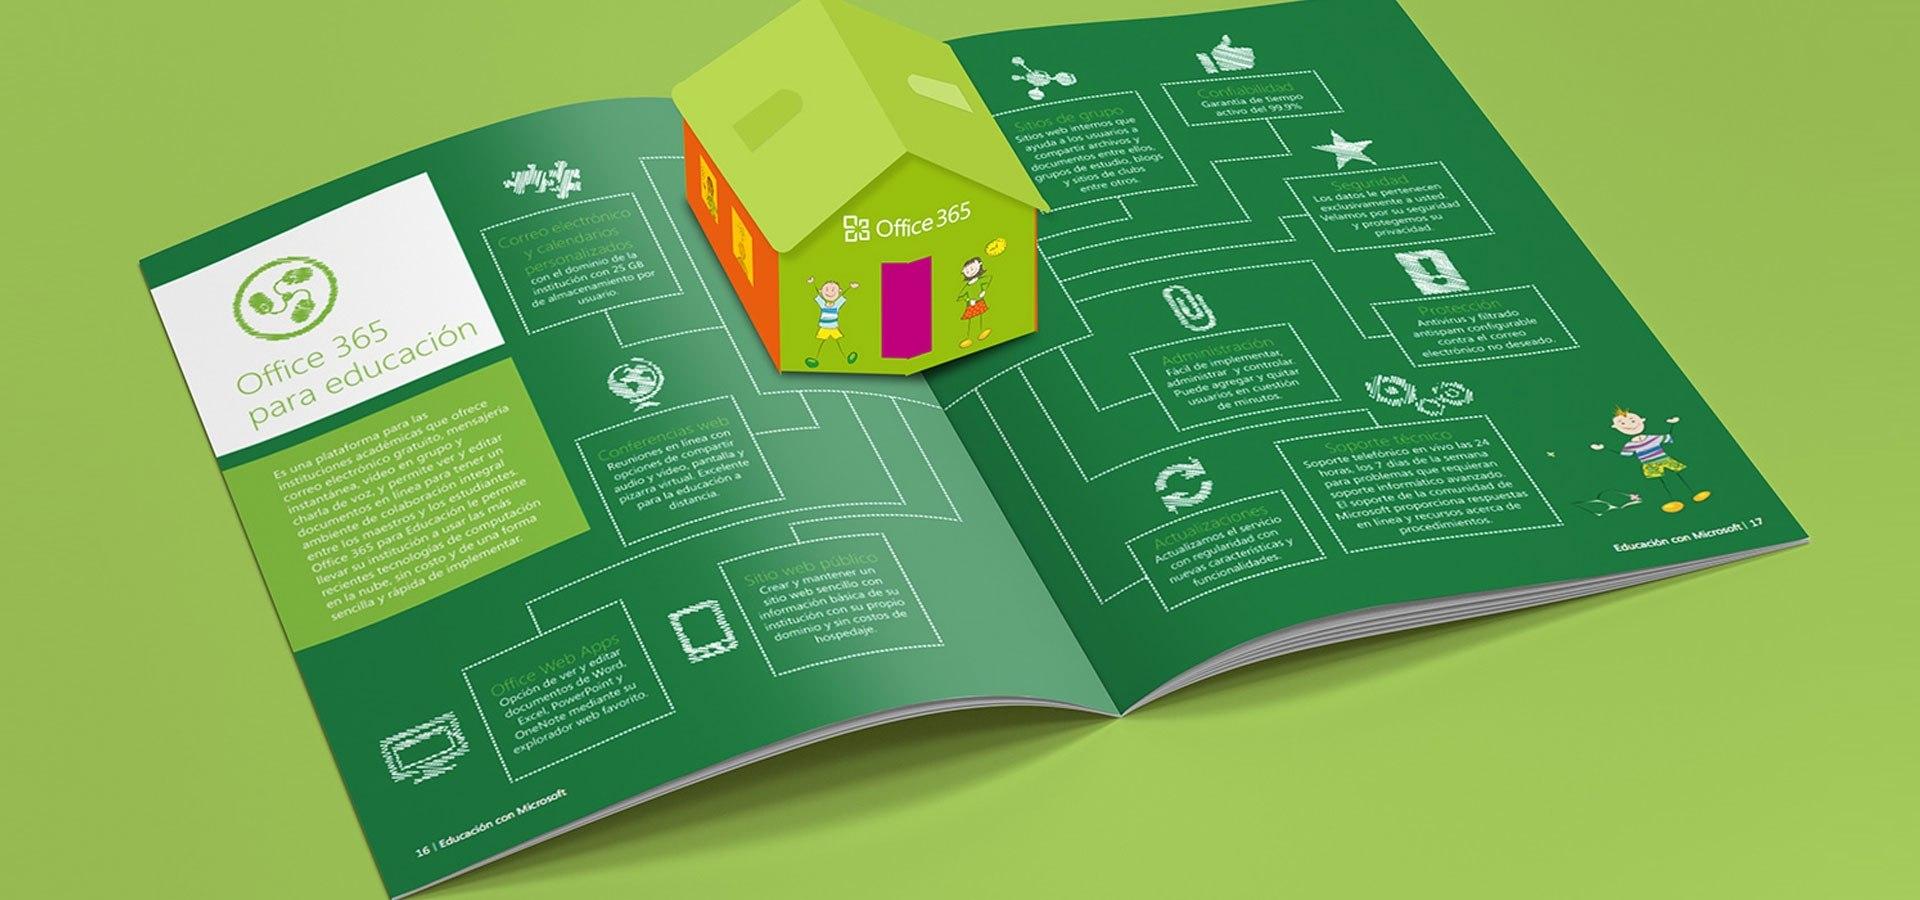 D Popup Brochure Designs  Free  Premium Templates With Pop Up Brochure Template